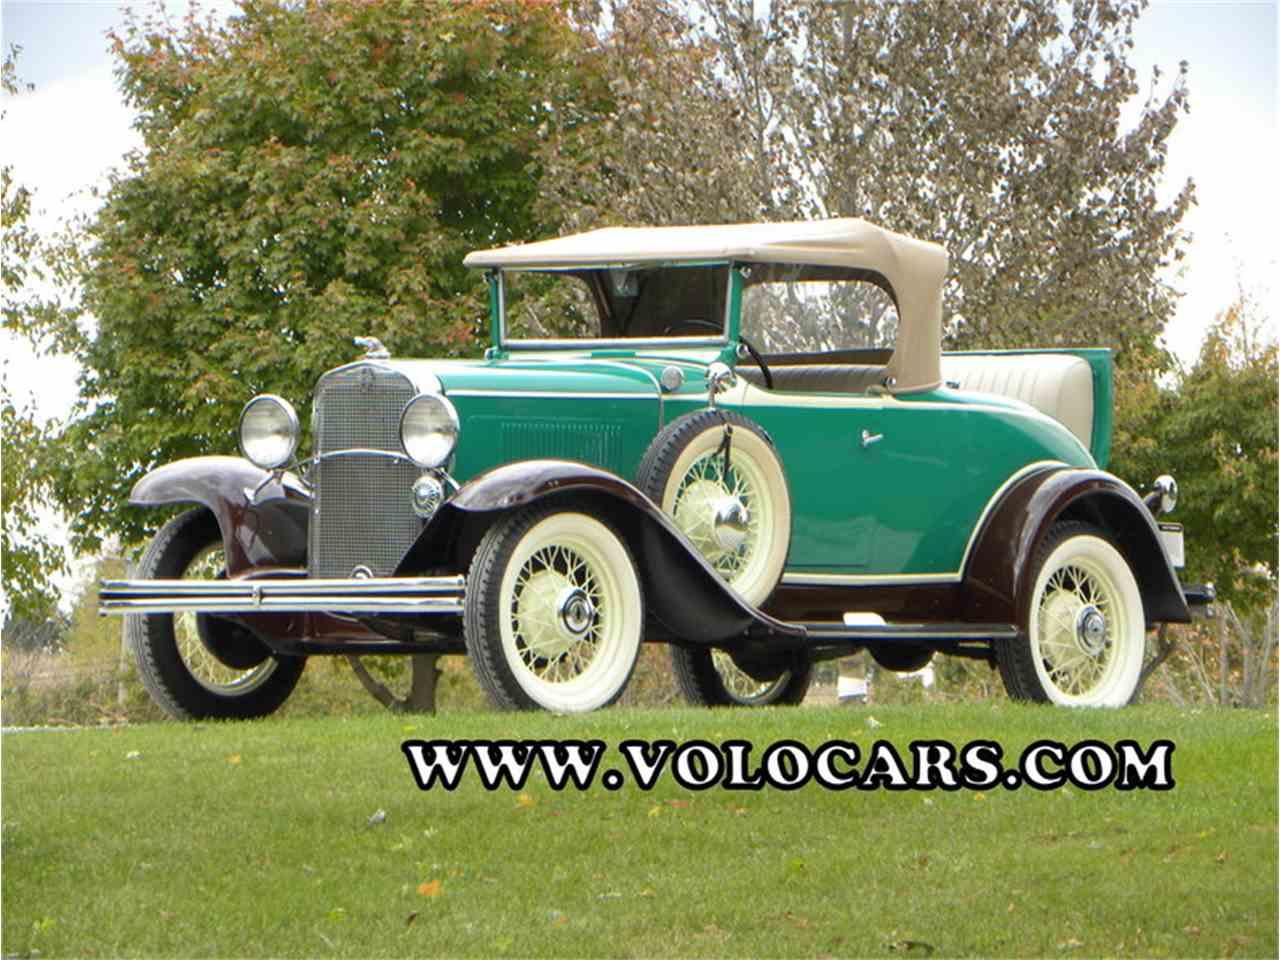 Sedan 1931 chevrolet sedan for sale : 1931 Chevrolet Independence Deluxe Roadster Series AE for Sale ...